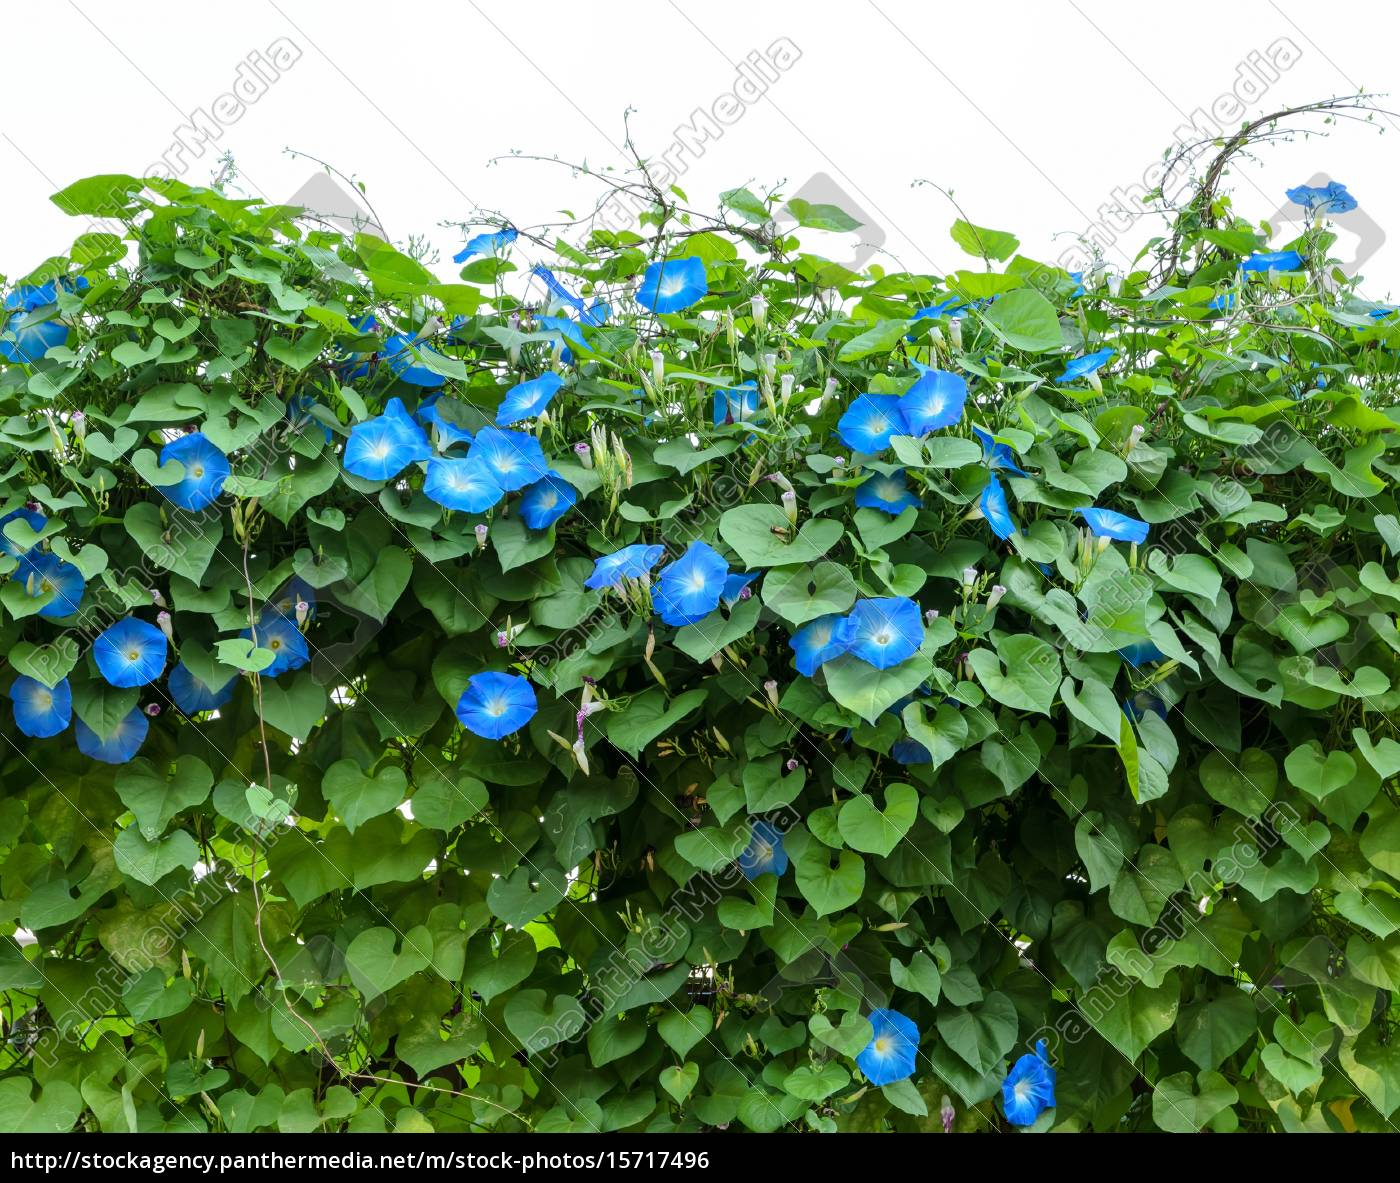 Blue Morning Glory Flower Plant Royalty Free Photo 15717496 Panthermedia Stock Agency